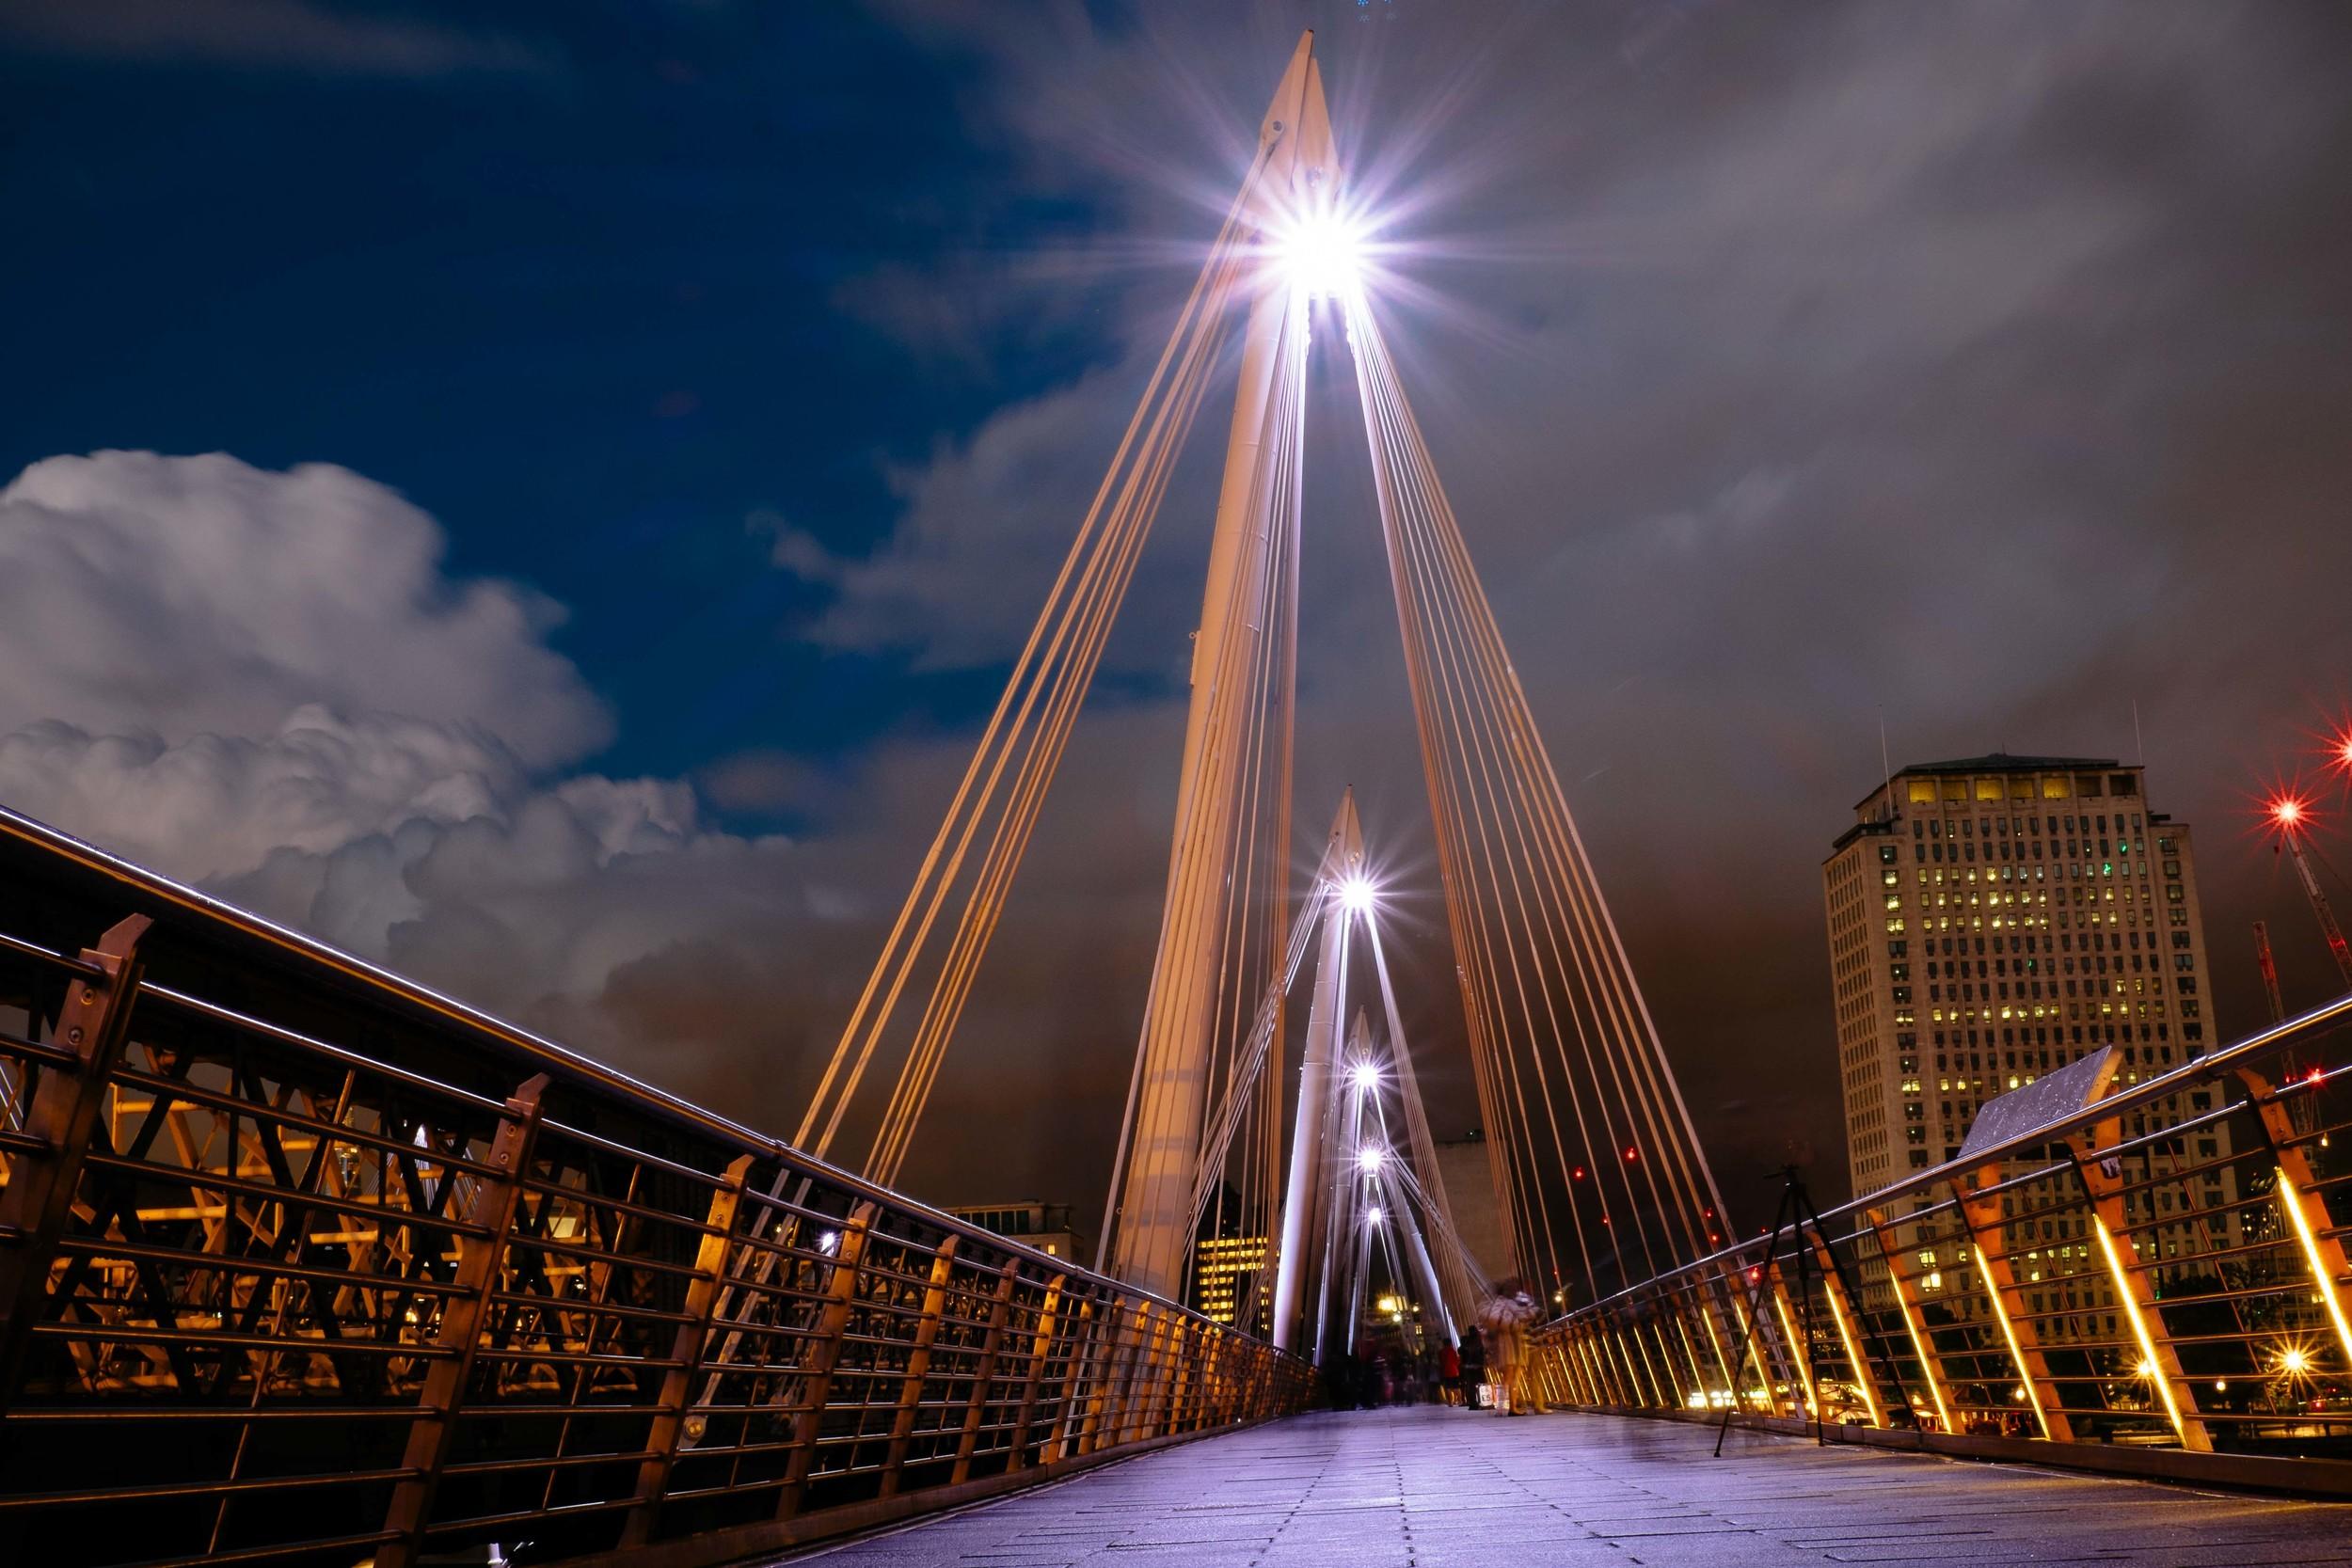 Golden Jubilee Bridge at night.